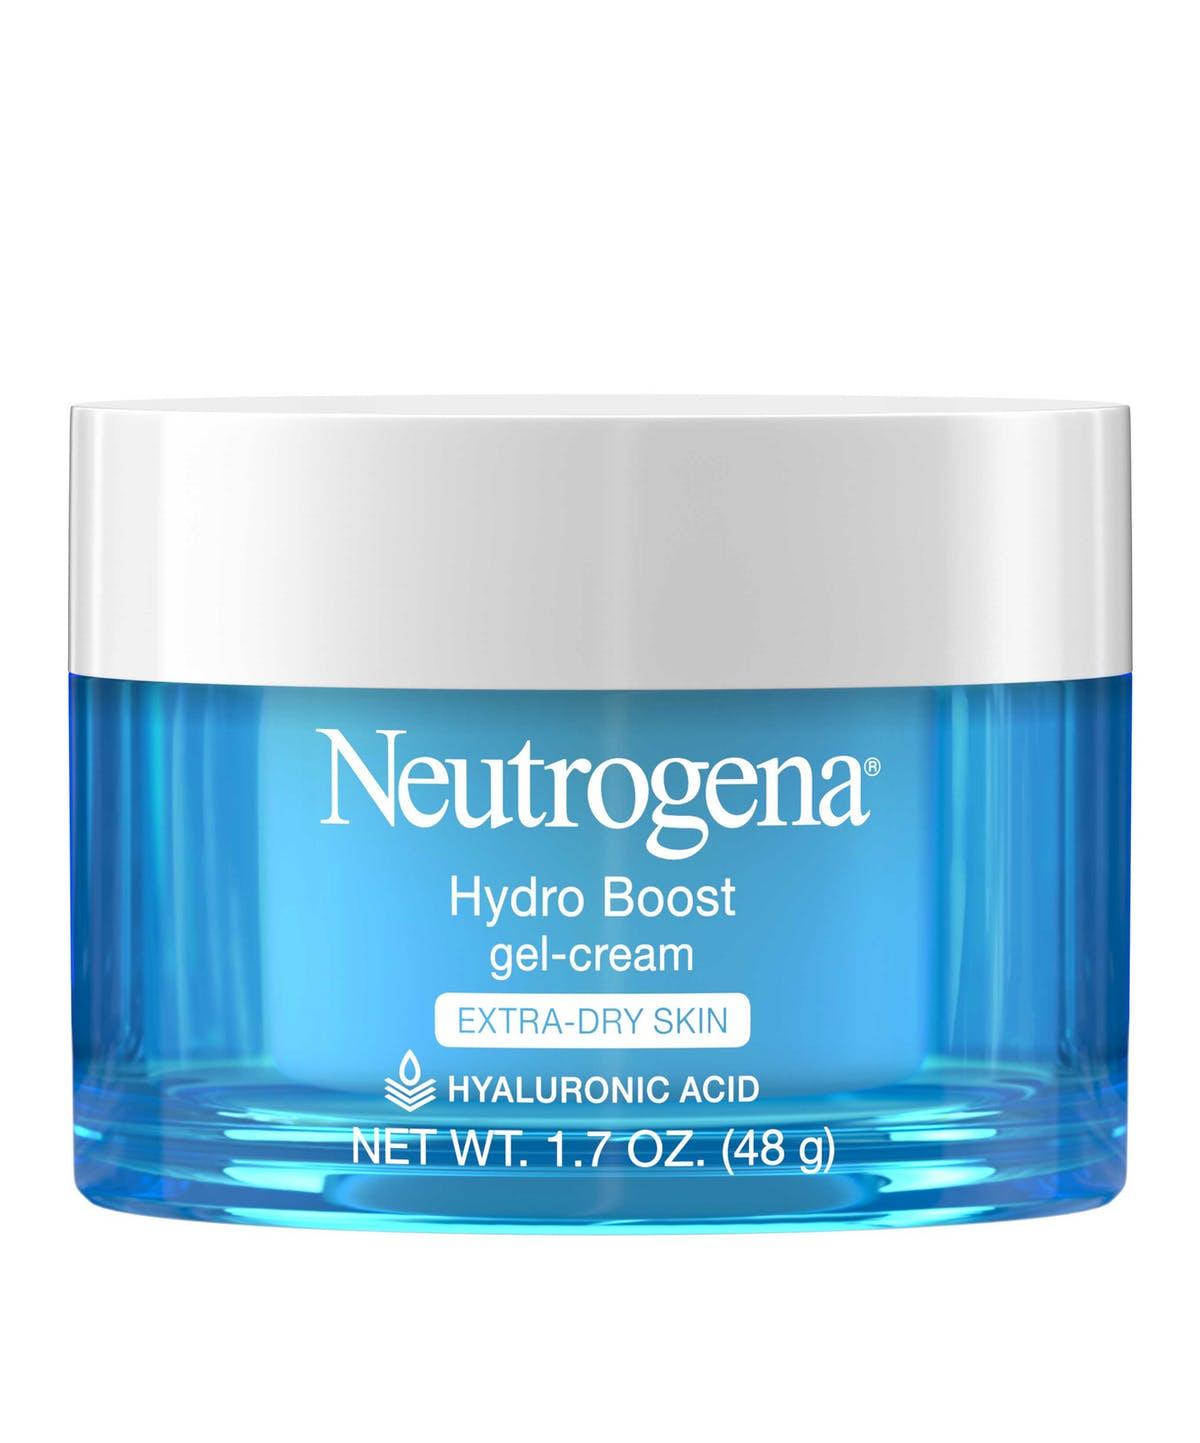 Kem Dưỡng Neutrogena Hydro Boots Gel-Cream Extra-Dry 48G